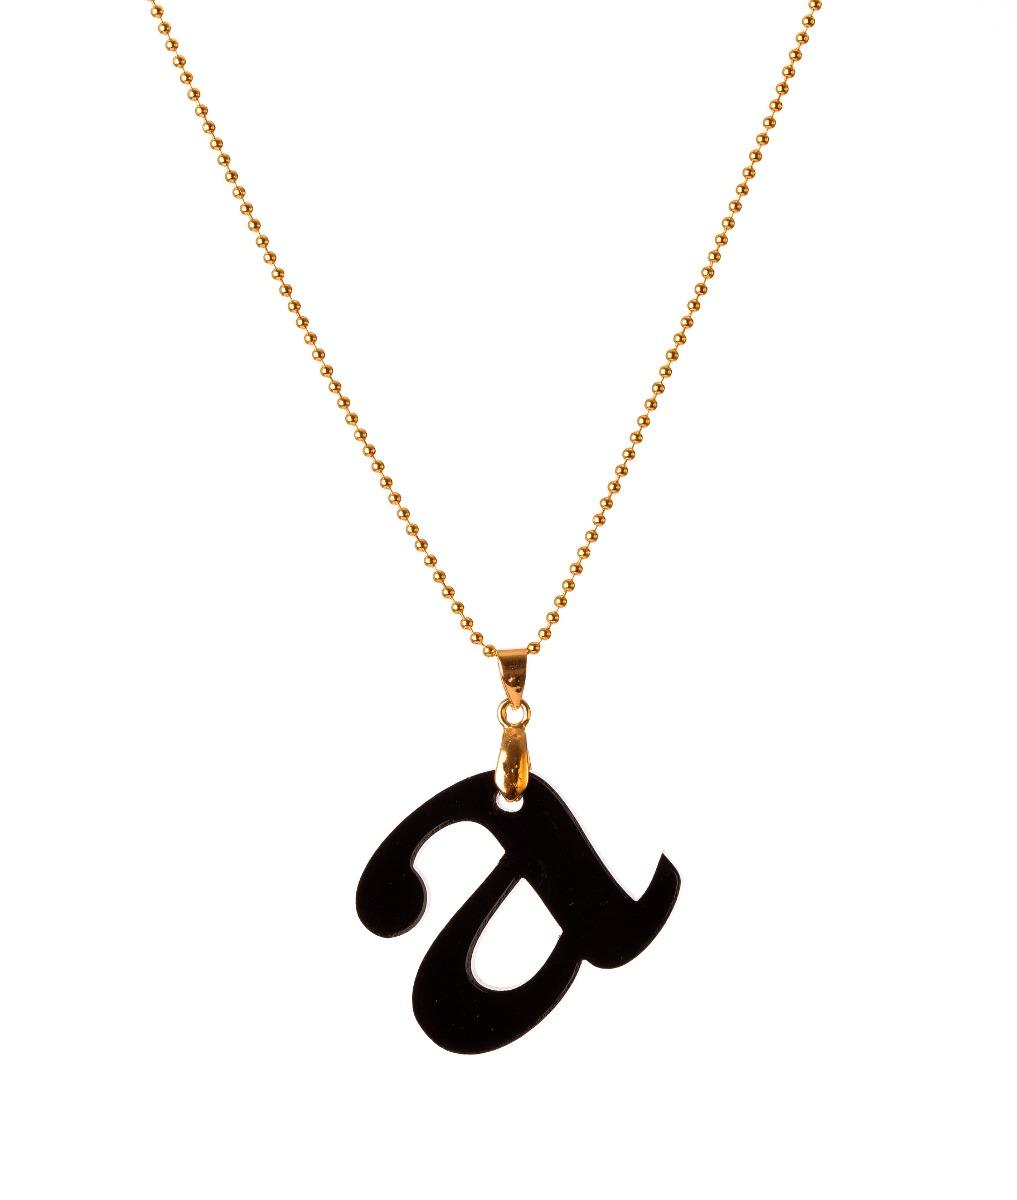 Collar van grieken letra b acrilico ba o de oro 18k - Bano de oro precio ...